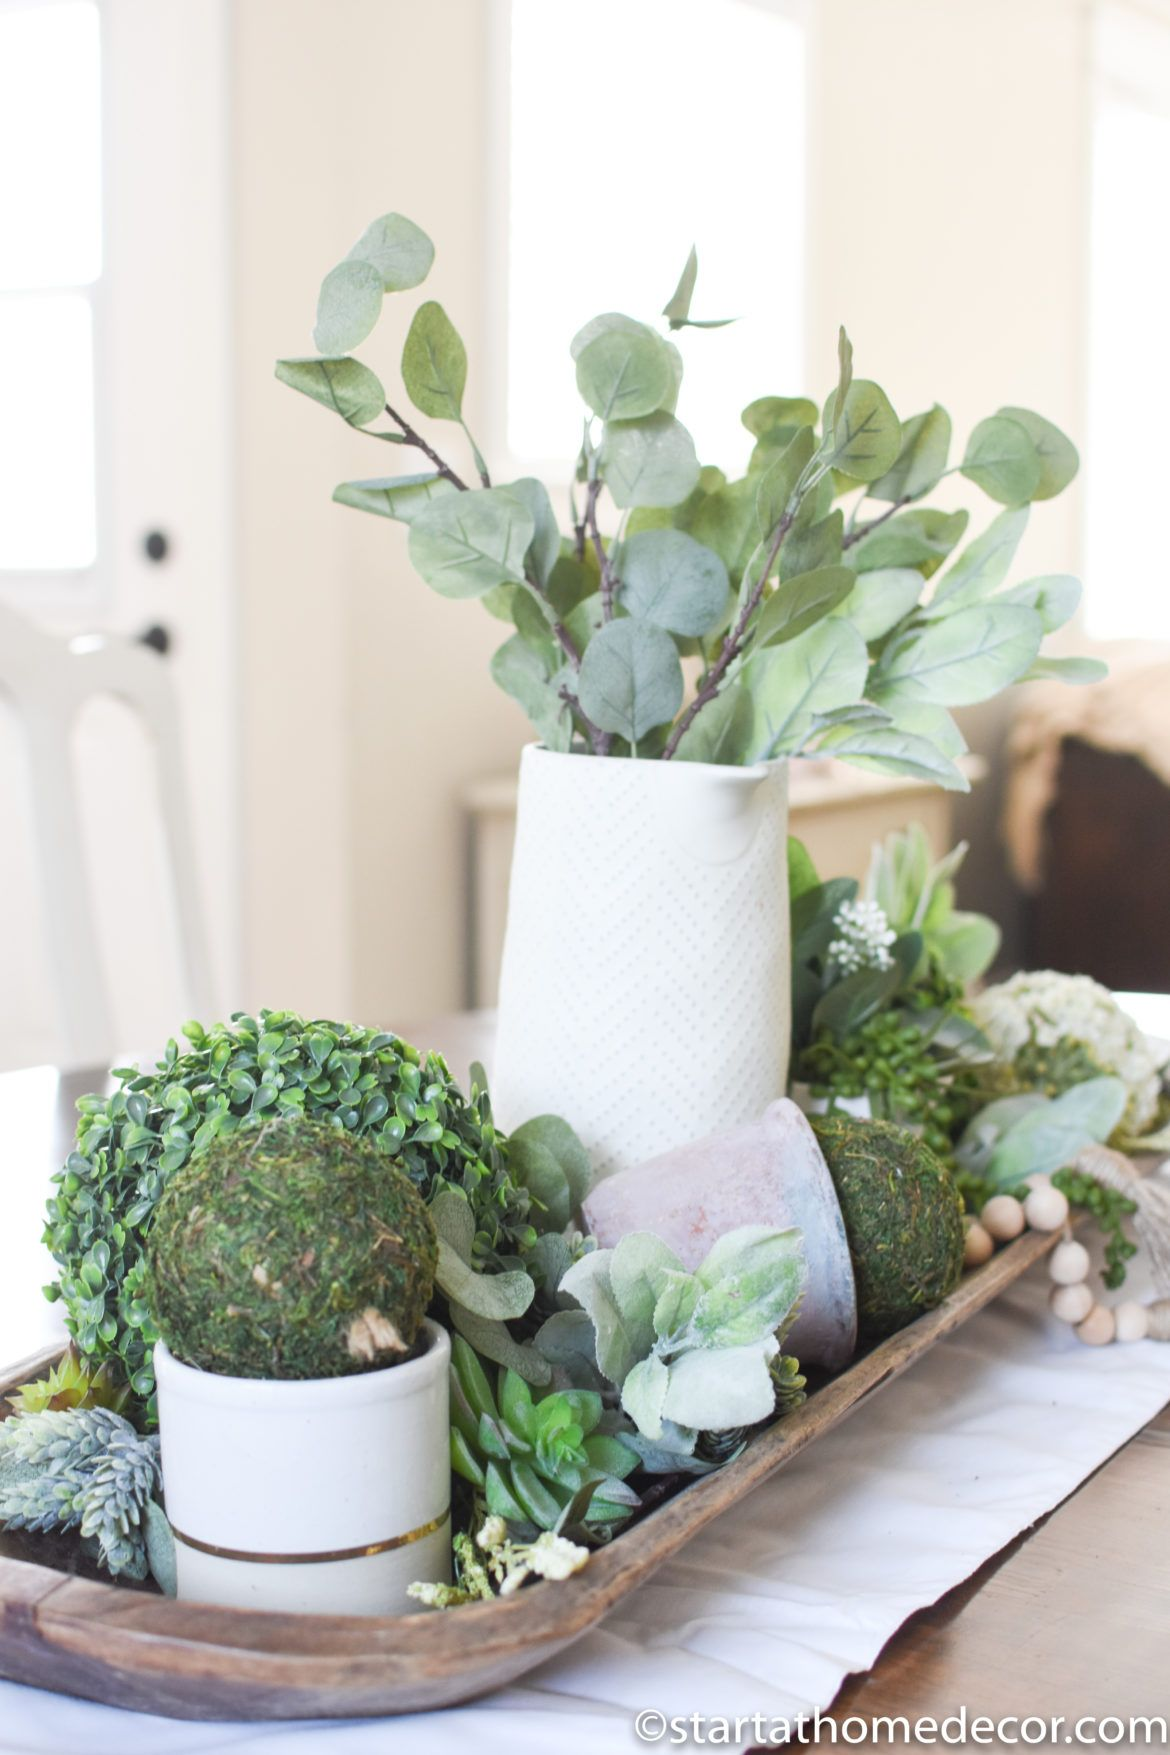 Plants For Kitchen To Decorate It: Farmhouse Decor, Cheap Home Decor, Home Decor